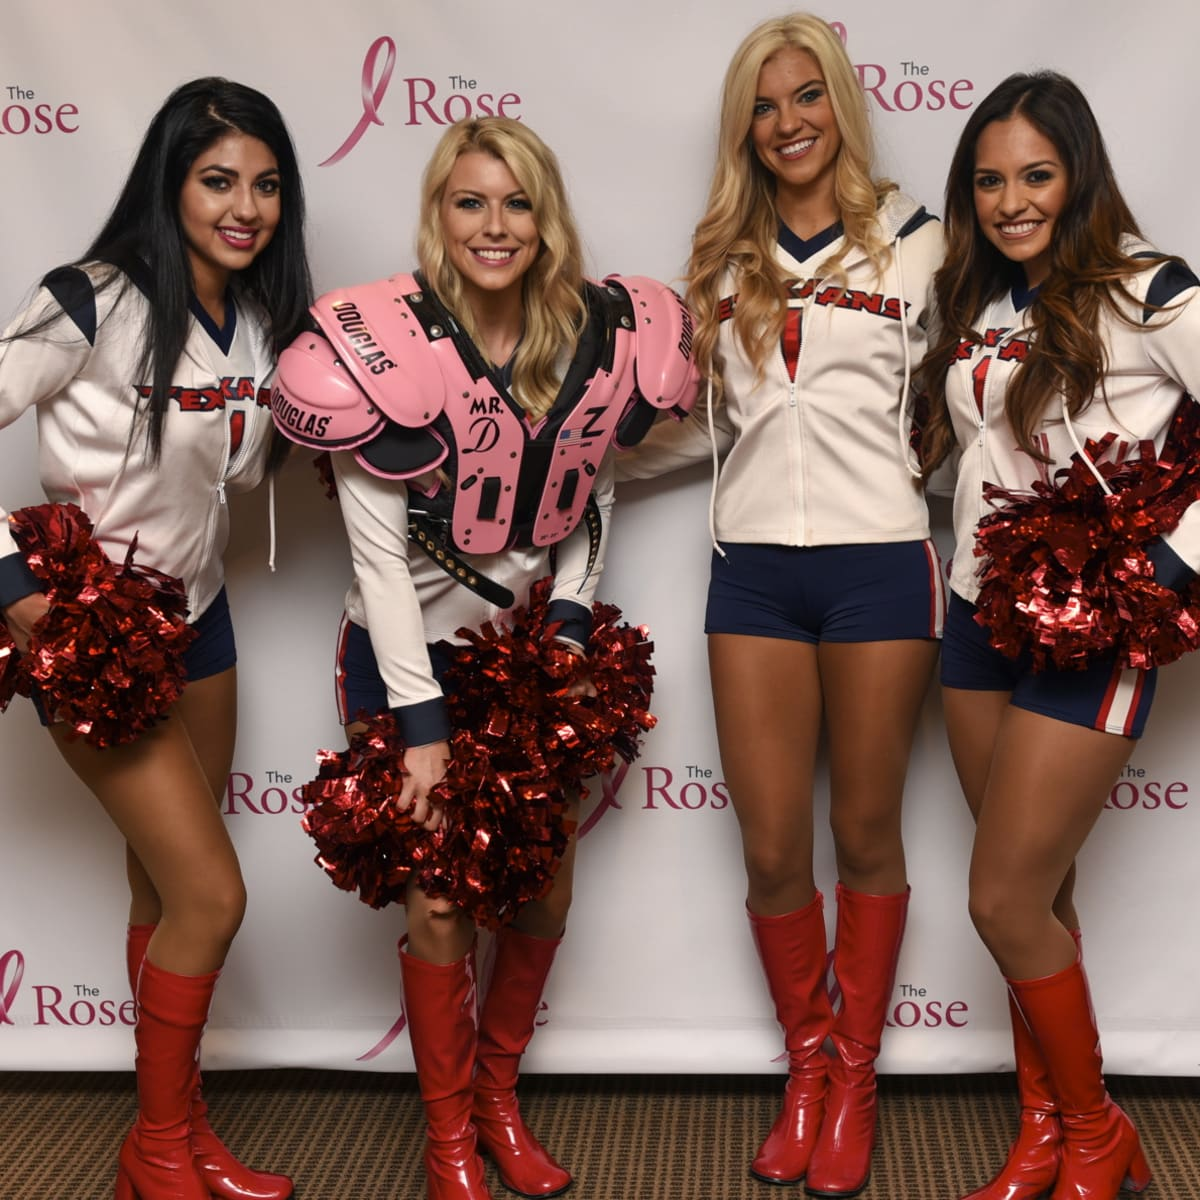 Houston, The Rose Pink Pads, July 2015, Texans cheerleaders